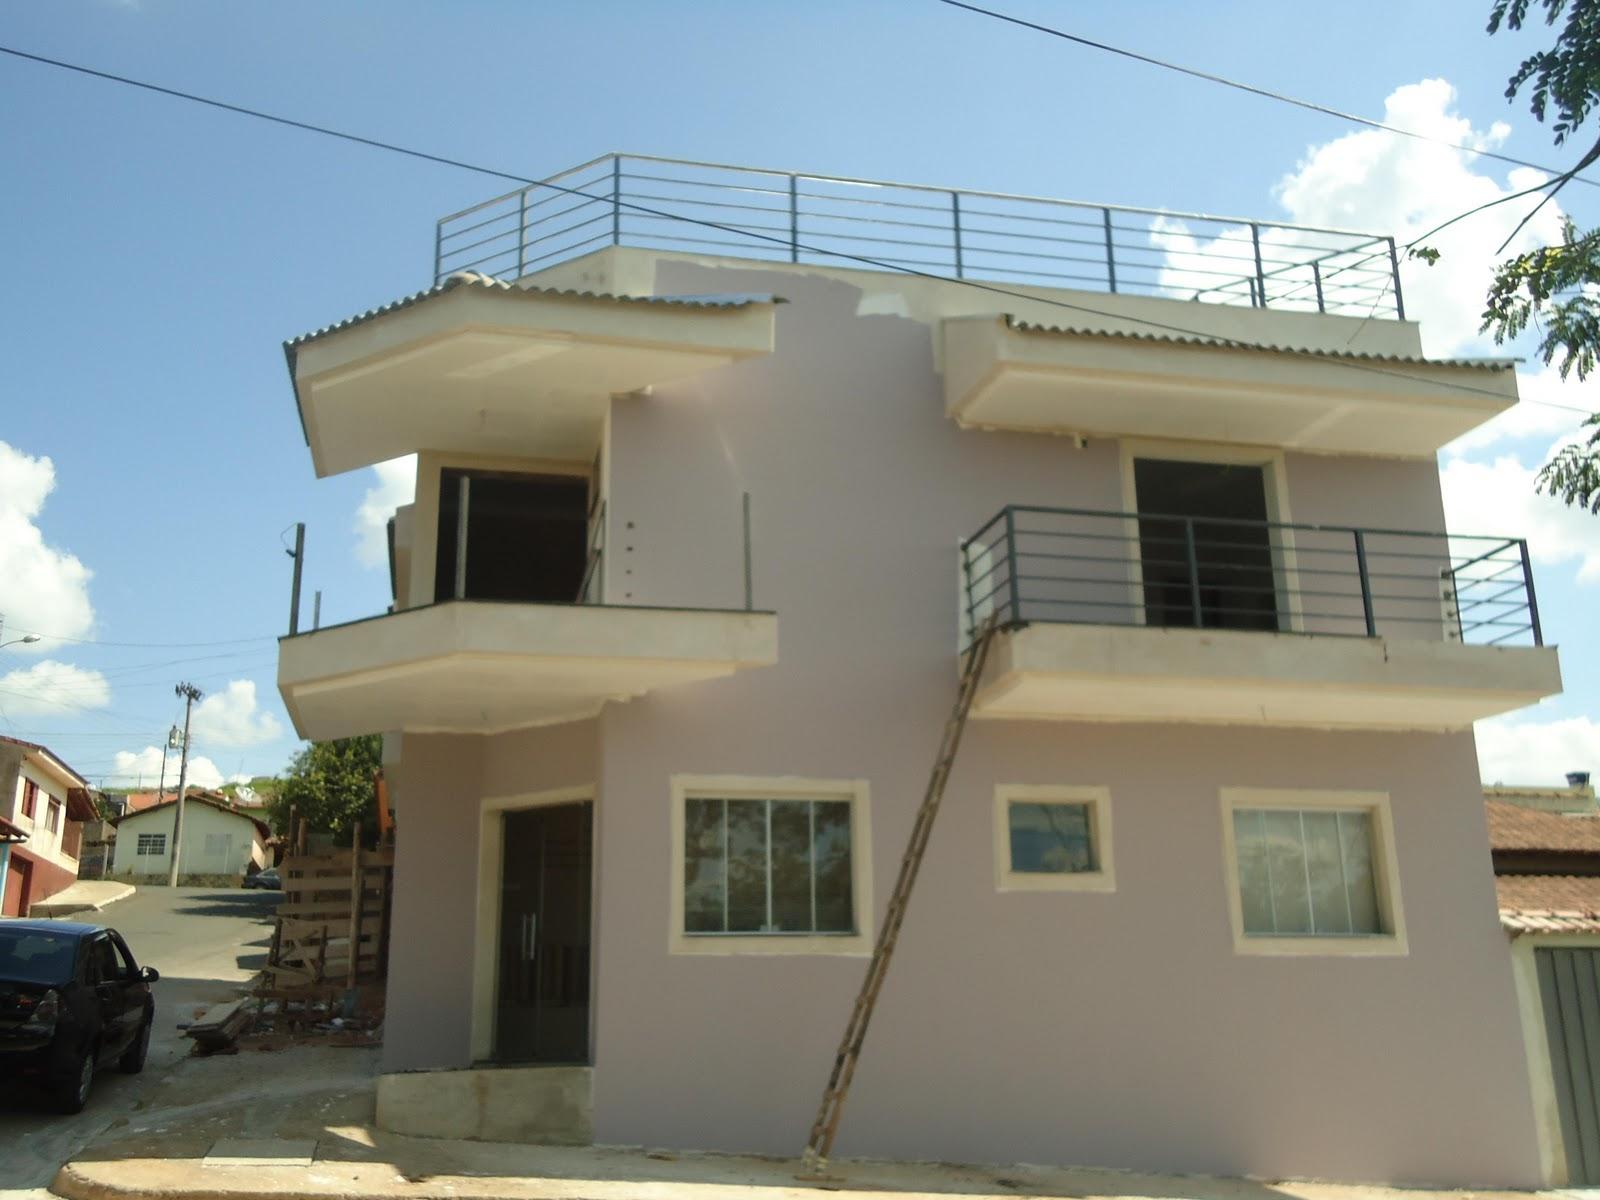 Fotos fachadas casas bonitas hogar total ajilbabcom portal - Casas bonitas fotos ...